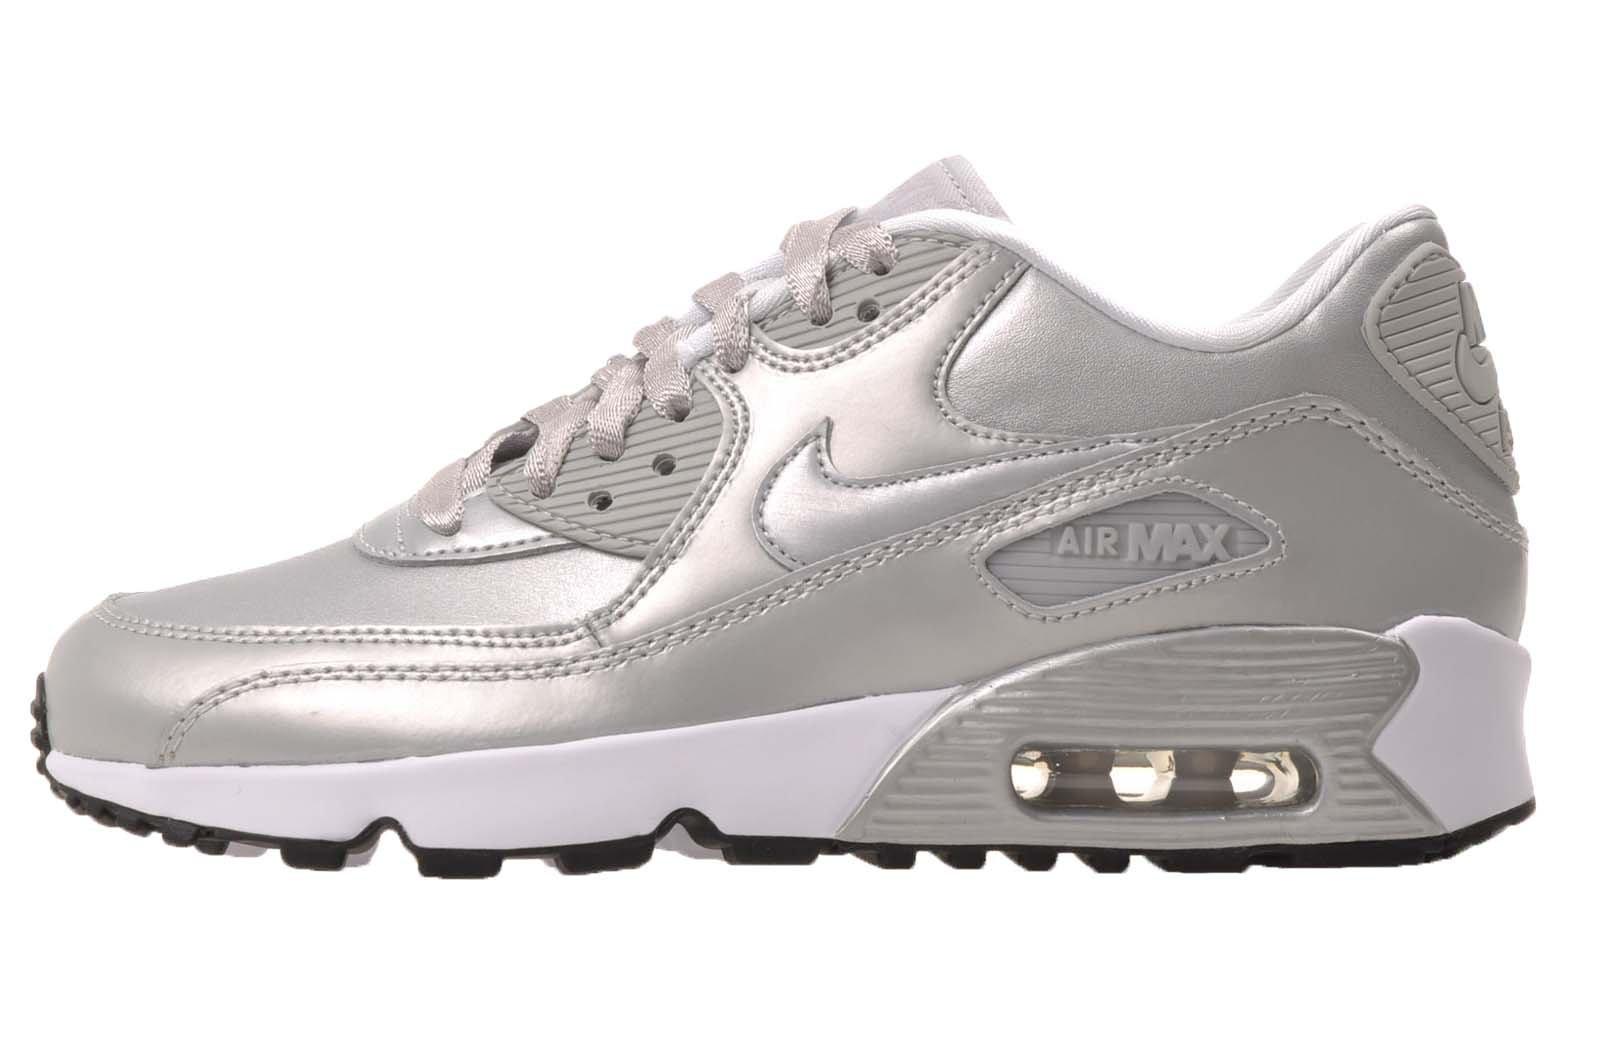 Nike Air Max 90 SE Leather GS (Metallic Platinum Metallic